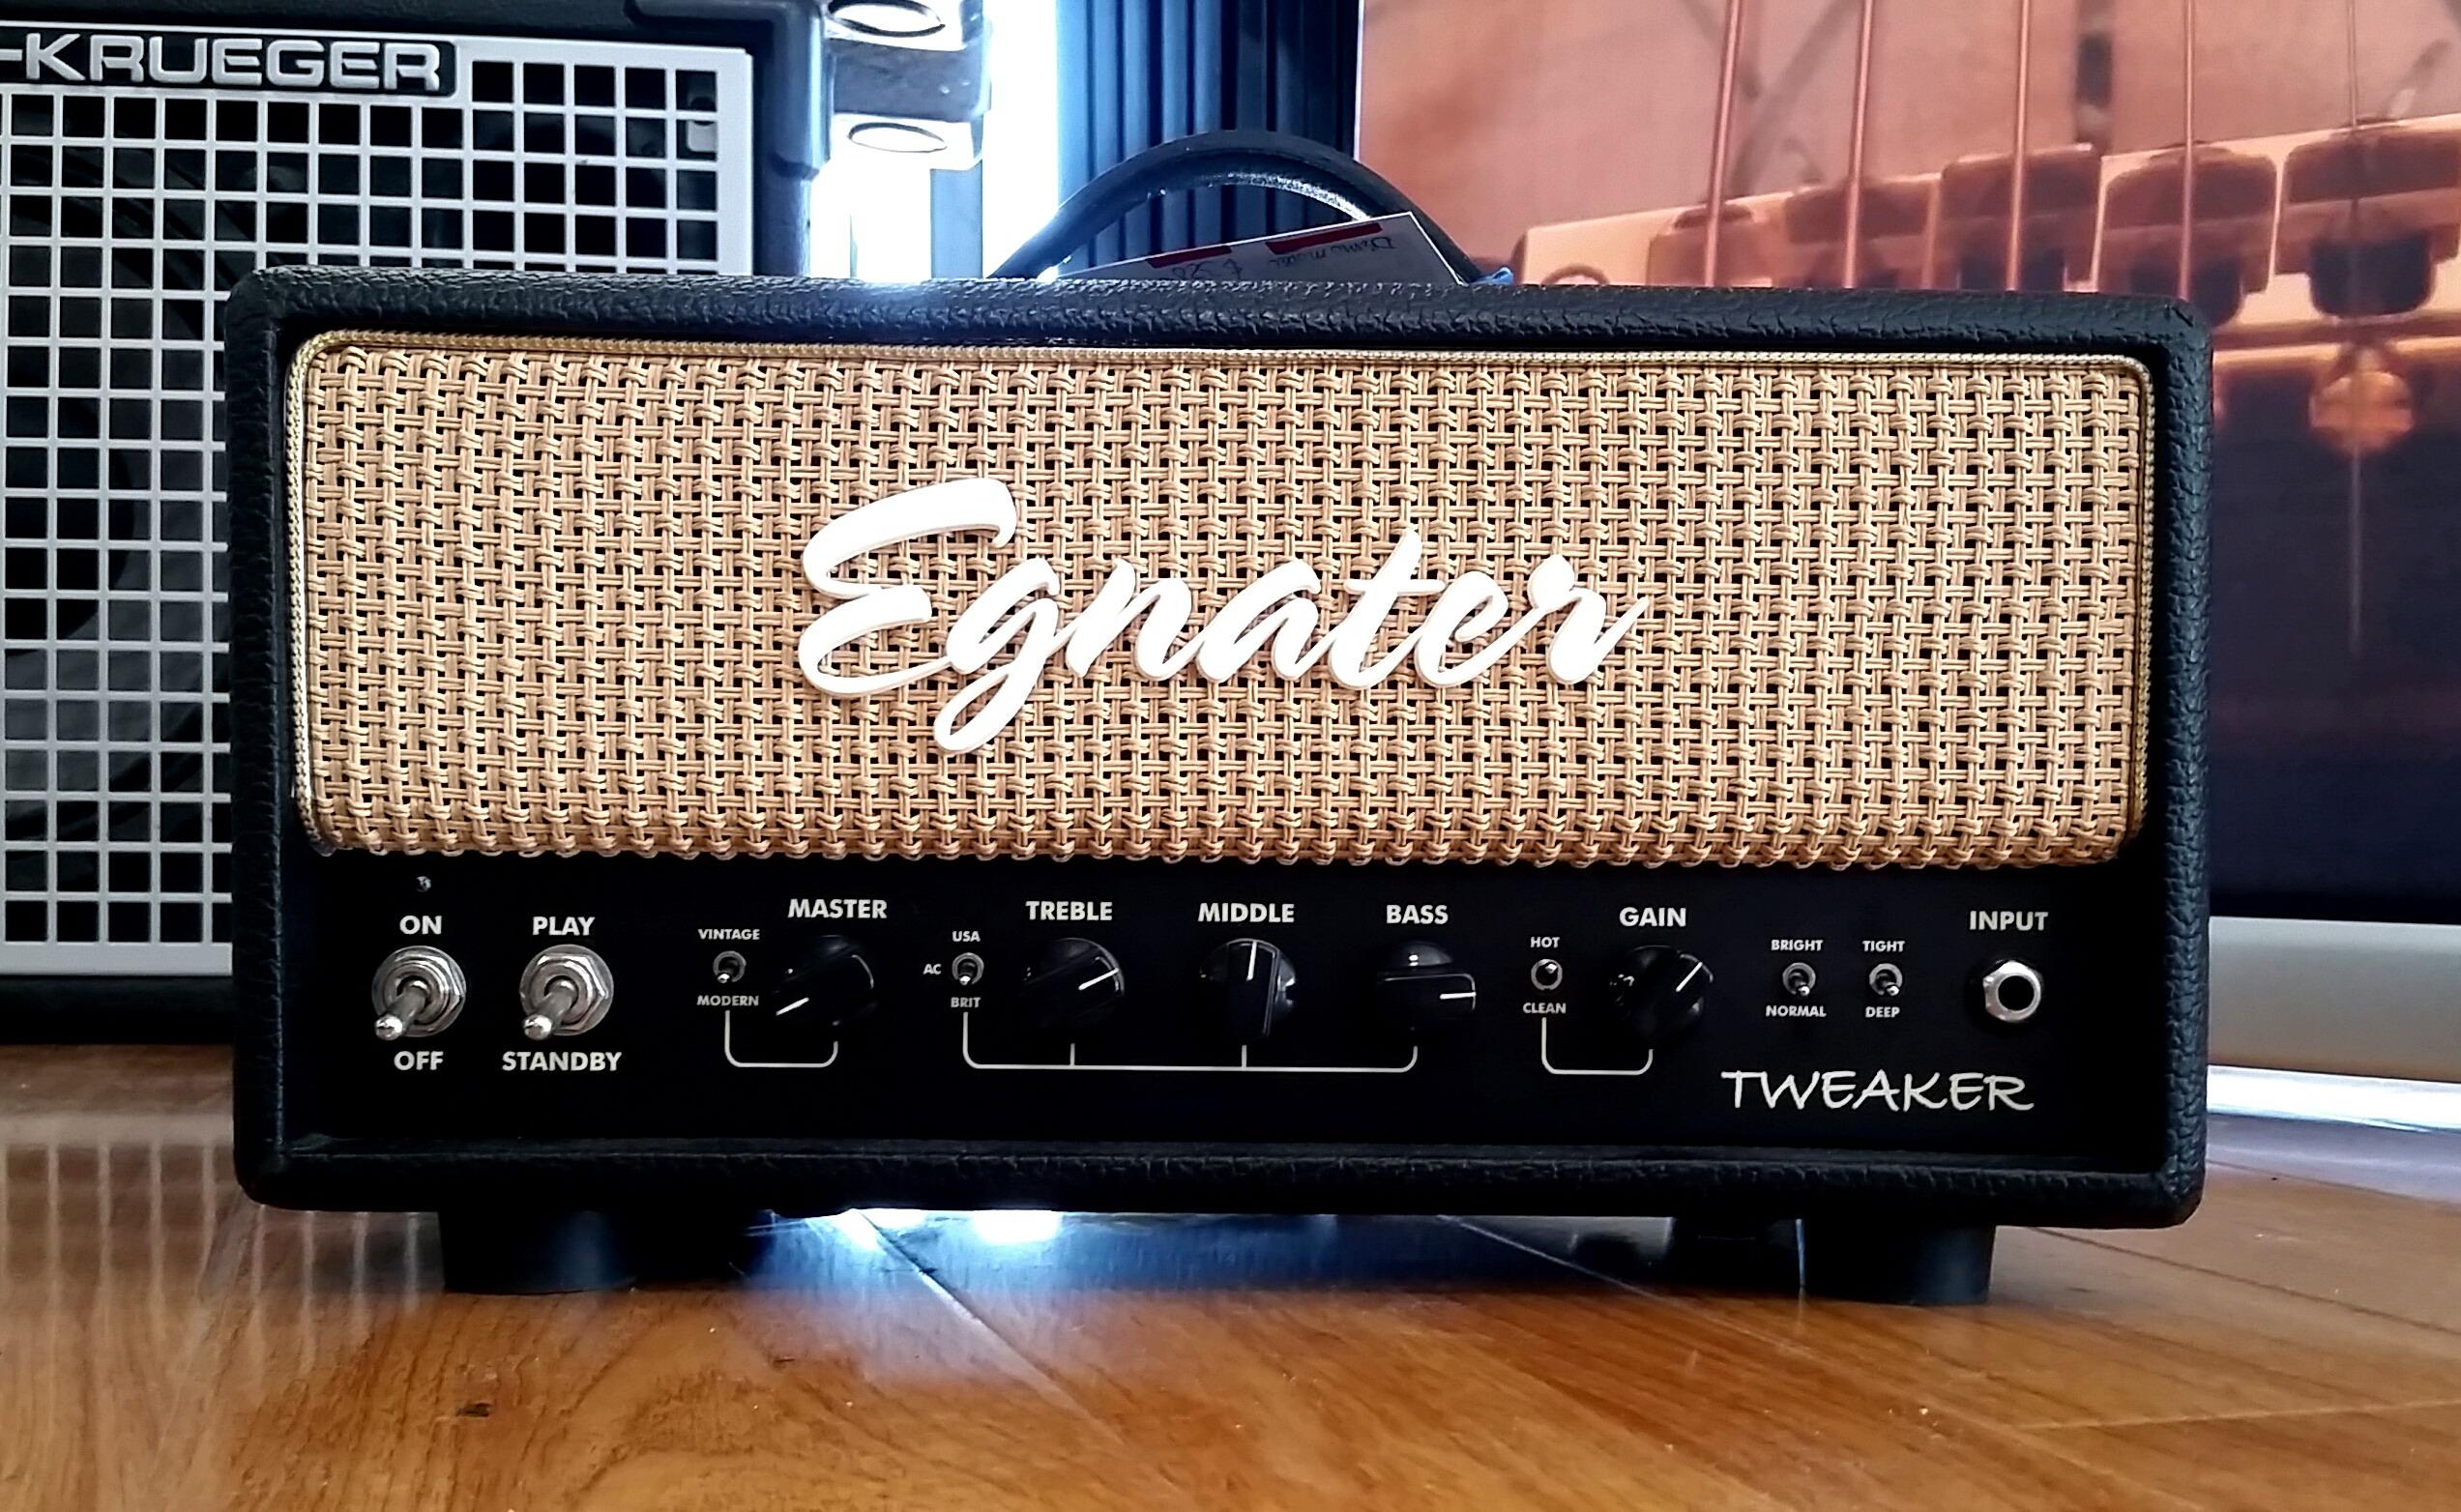 Egnater Tweaker 32099 Guitarbasspro Bass Guitars Emg Active Pickup Wiring For Dean Vx Brands Amplifiers Guitar